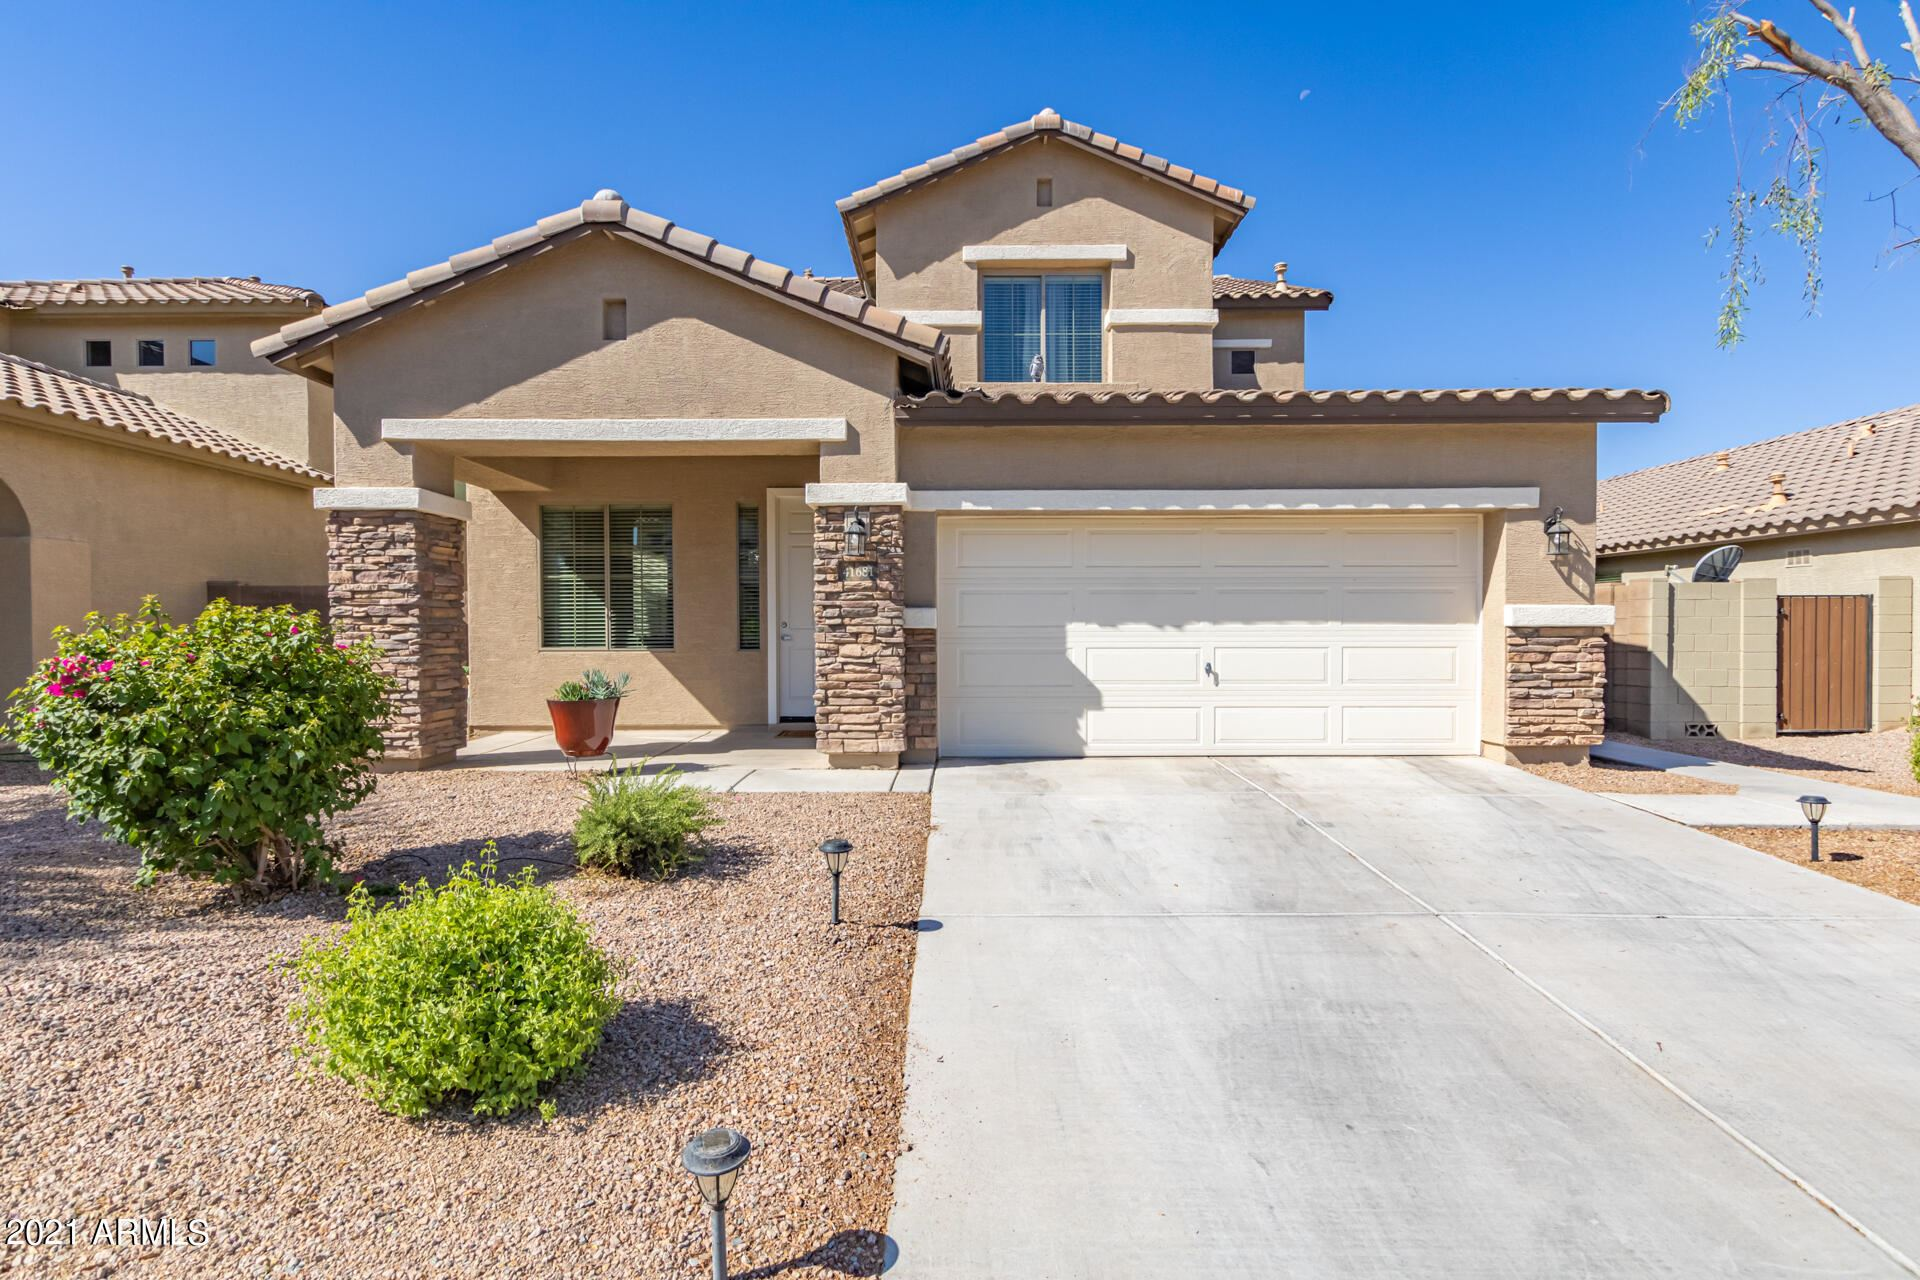 Photo for 41681 W CORVALIS Lane, Maricopa, AZ 85138 (MLS # 6244645)